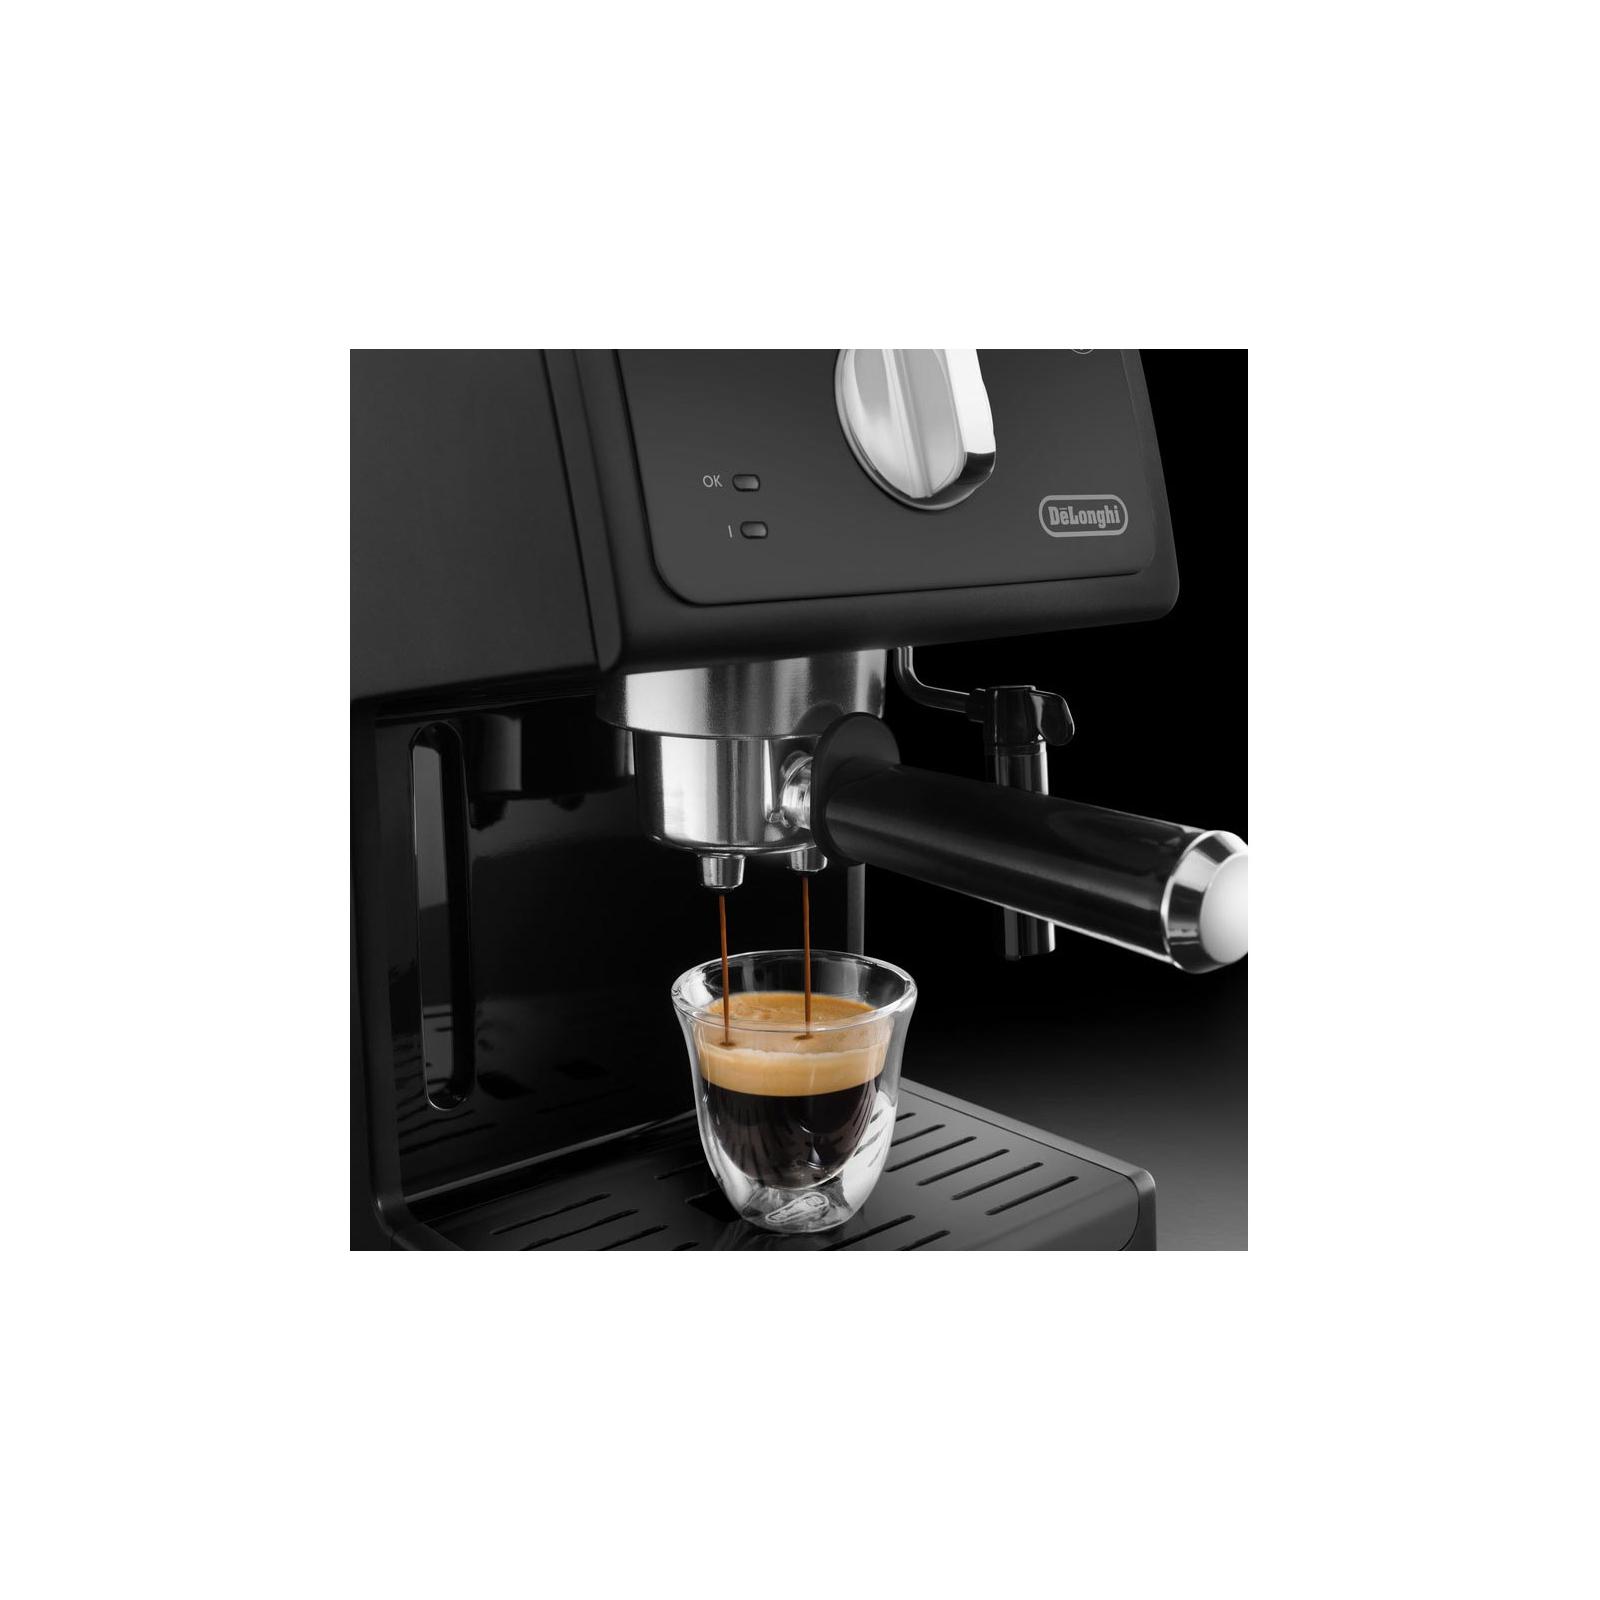 Кофеварка DeLonghi ECP 31.21 BK изображение 3